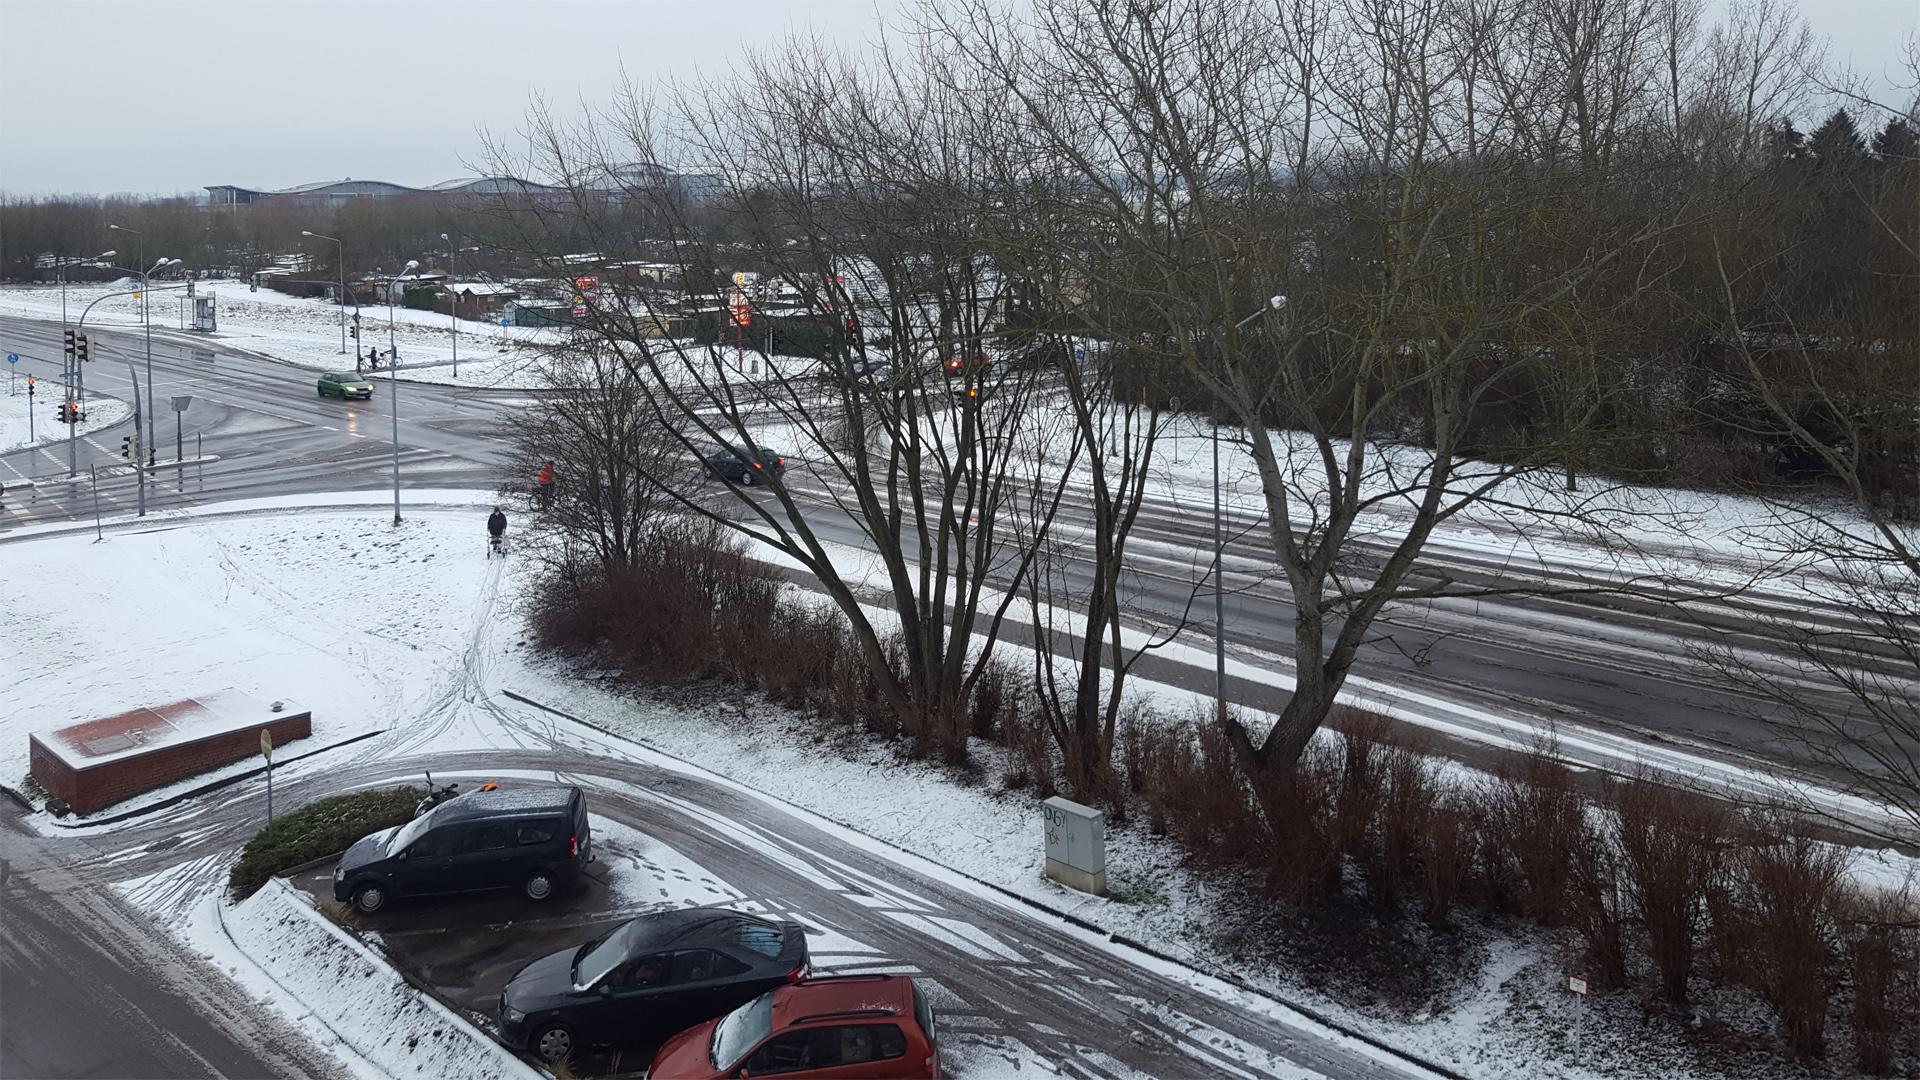 grau in grau trotz Schnee in Greifswald